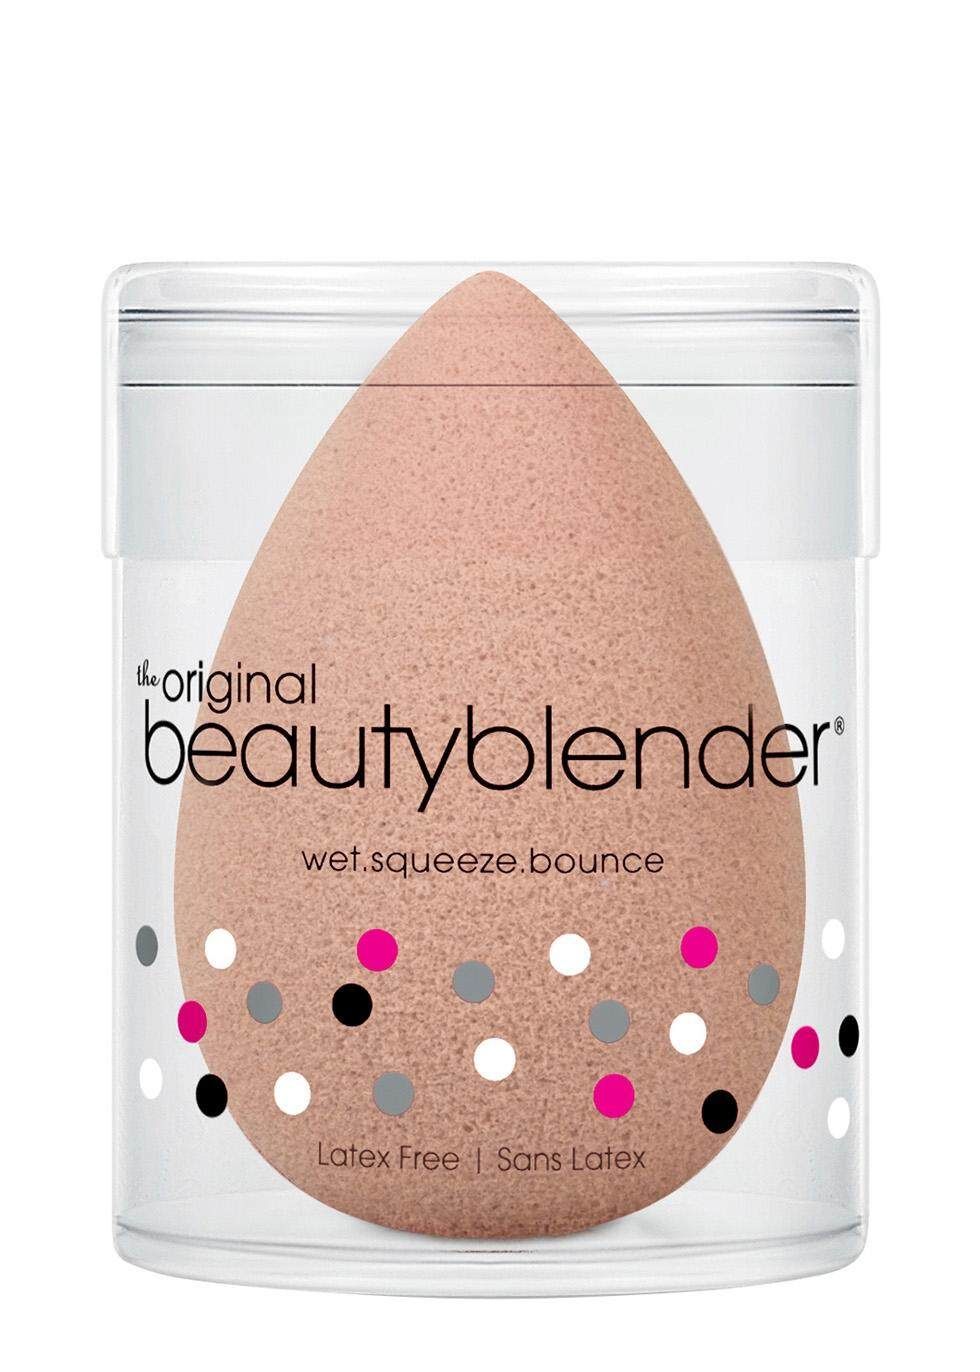 Beautyblender Original - Intl ฟองน้ำแต่งหน้า-เกลี่ยรองพื้น รูปไข่ By Tata Beauty05.